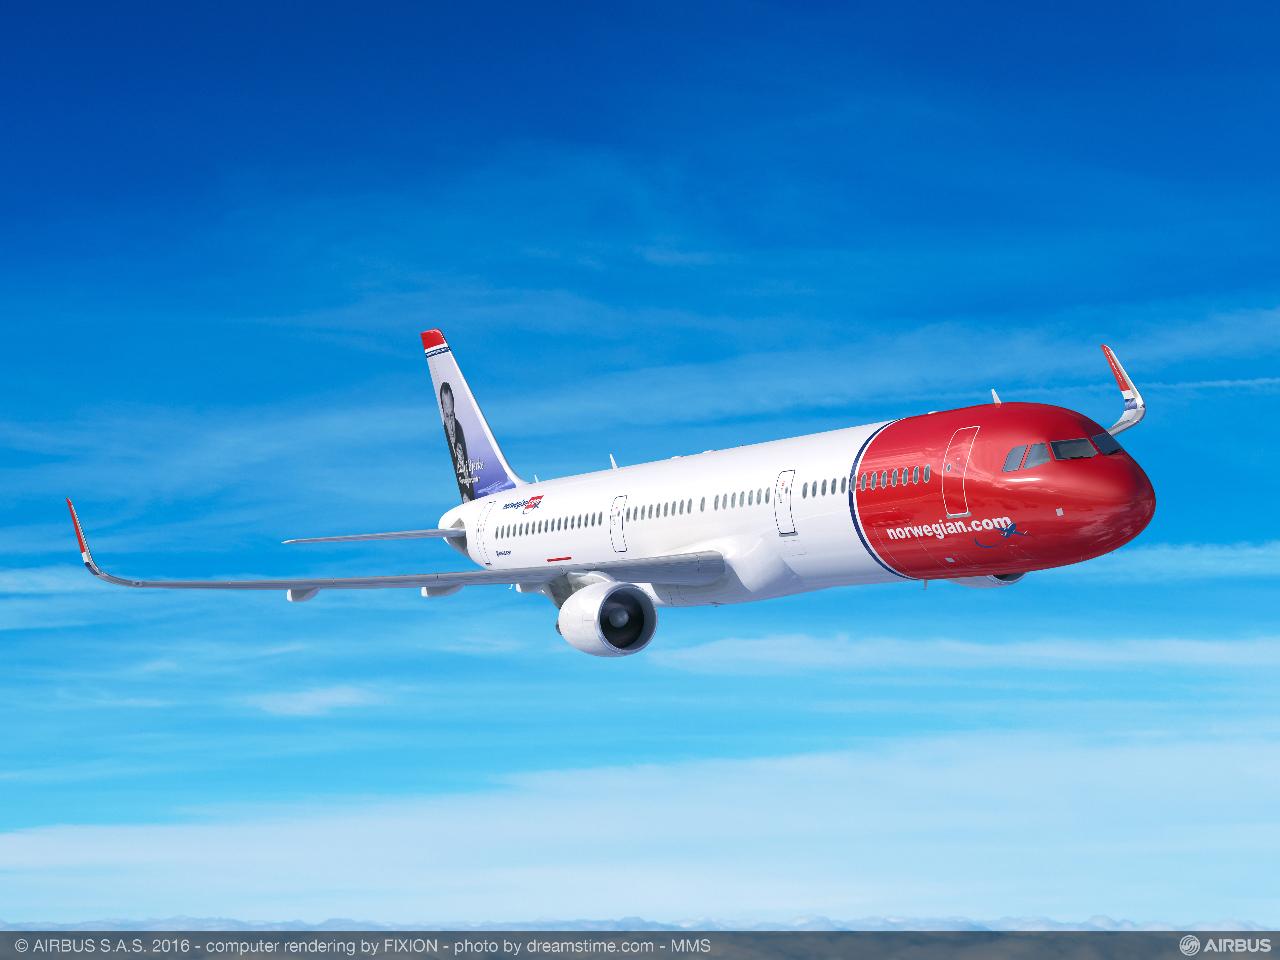 Farnborough 2016 : Norwegian prend 30 Airbus A321neo LR